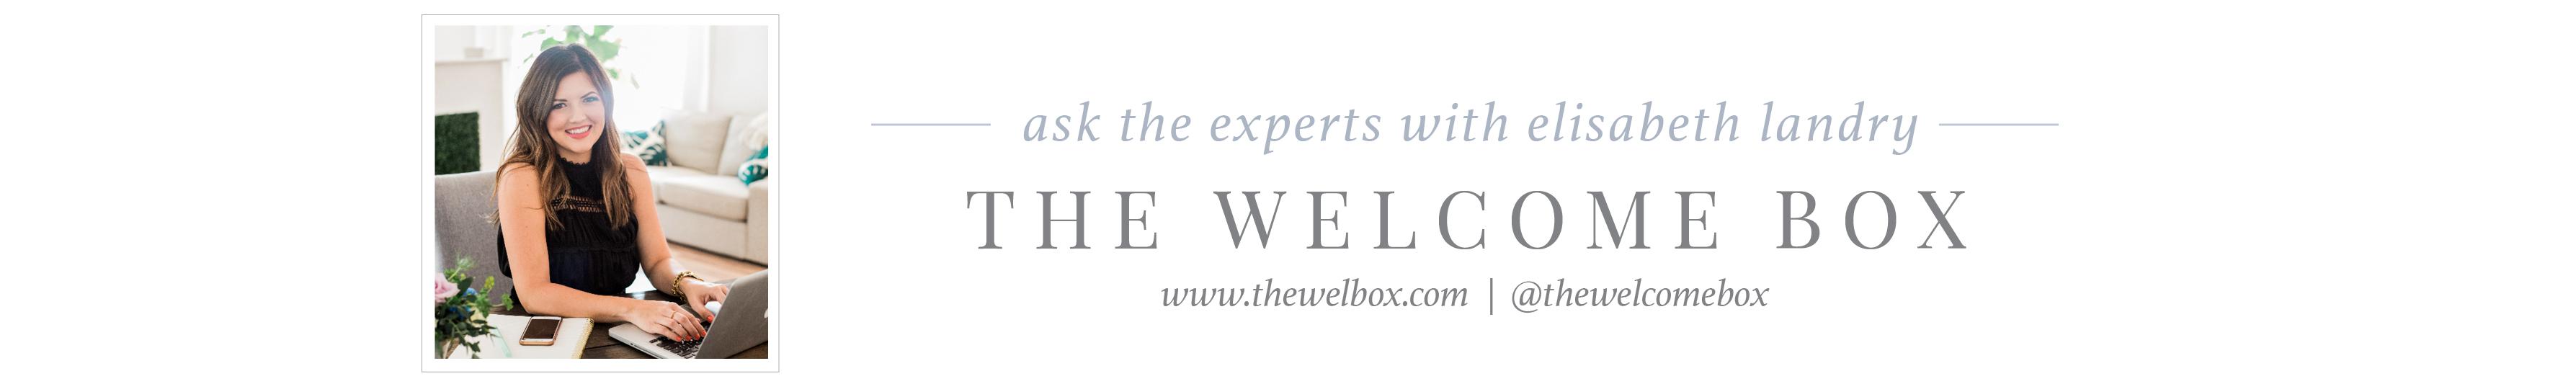 the welcome box wedding gift